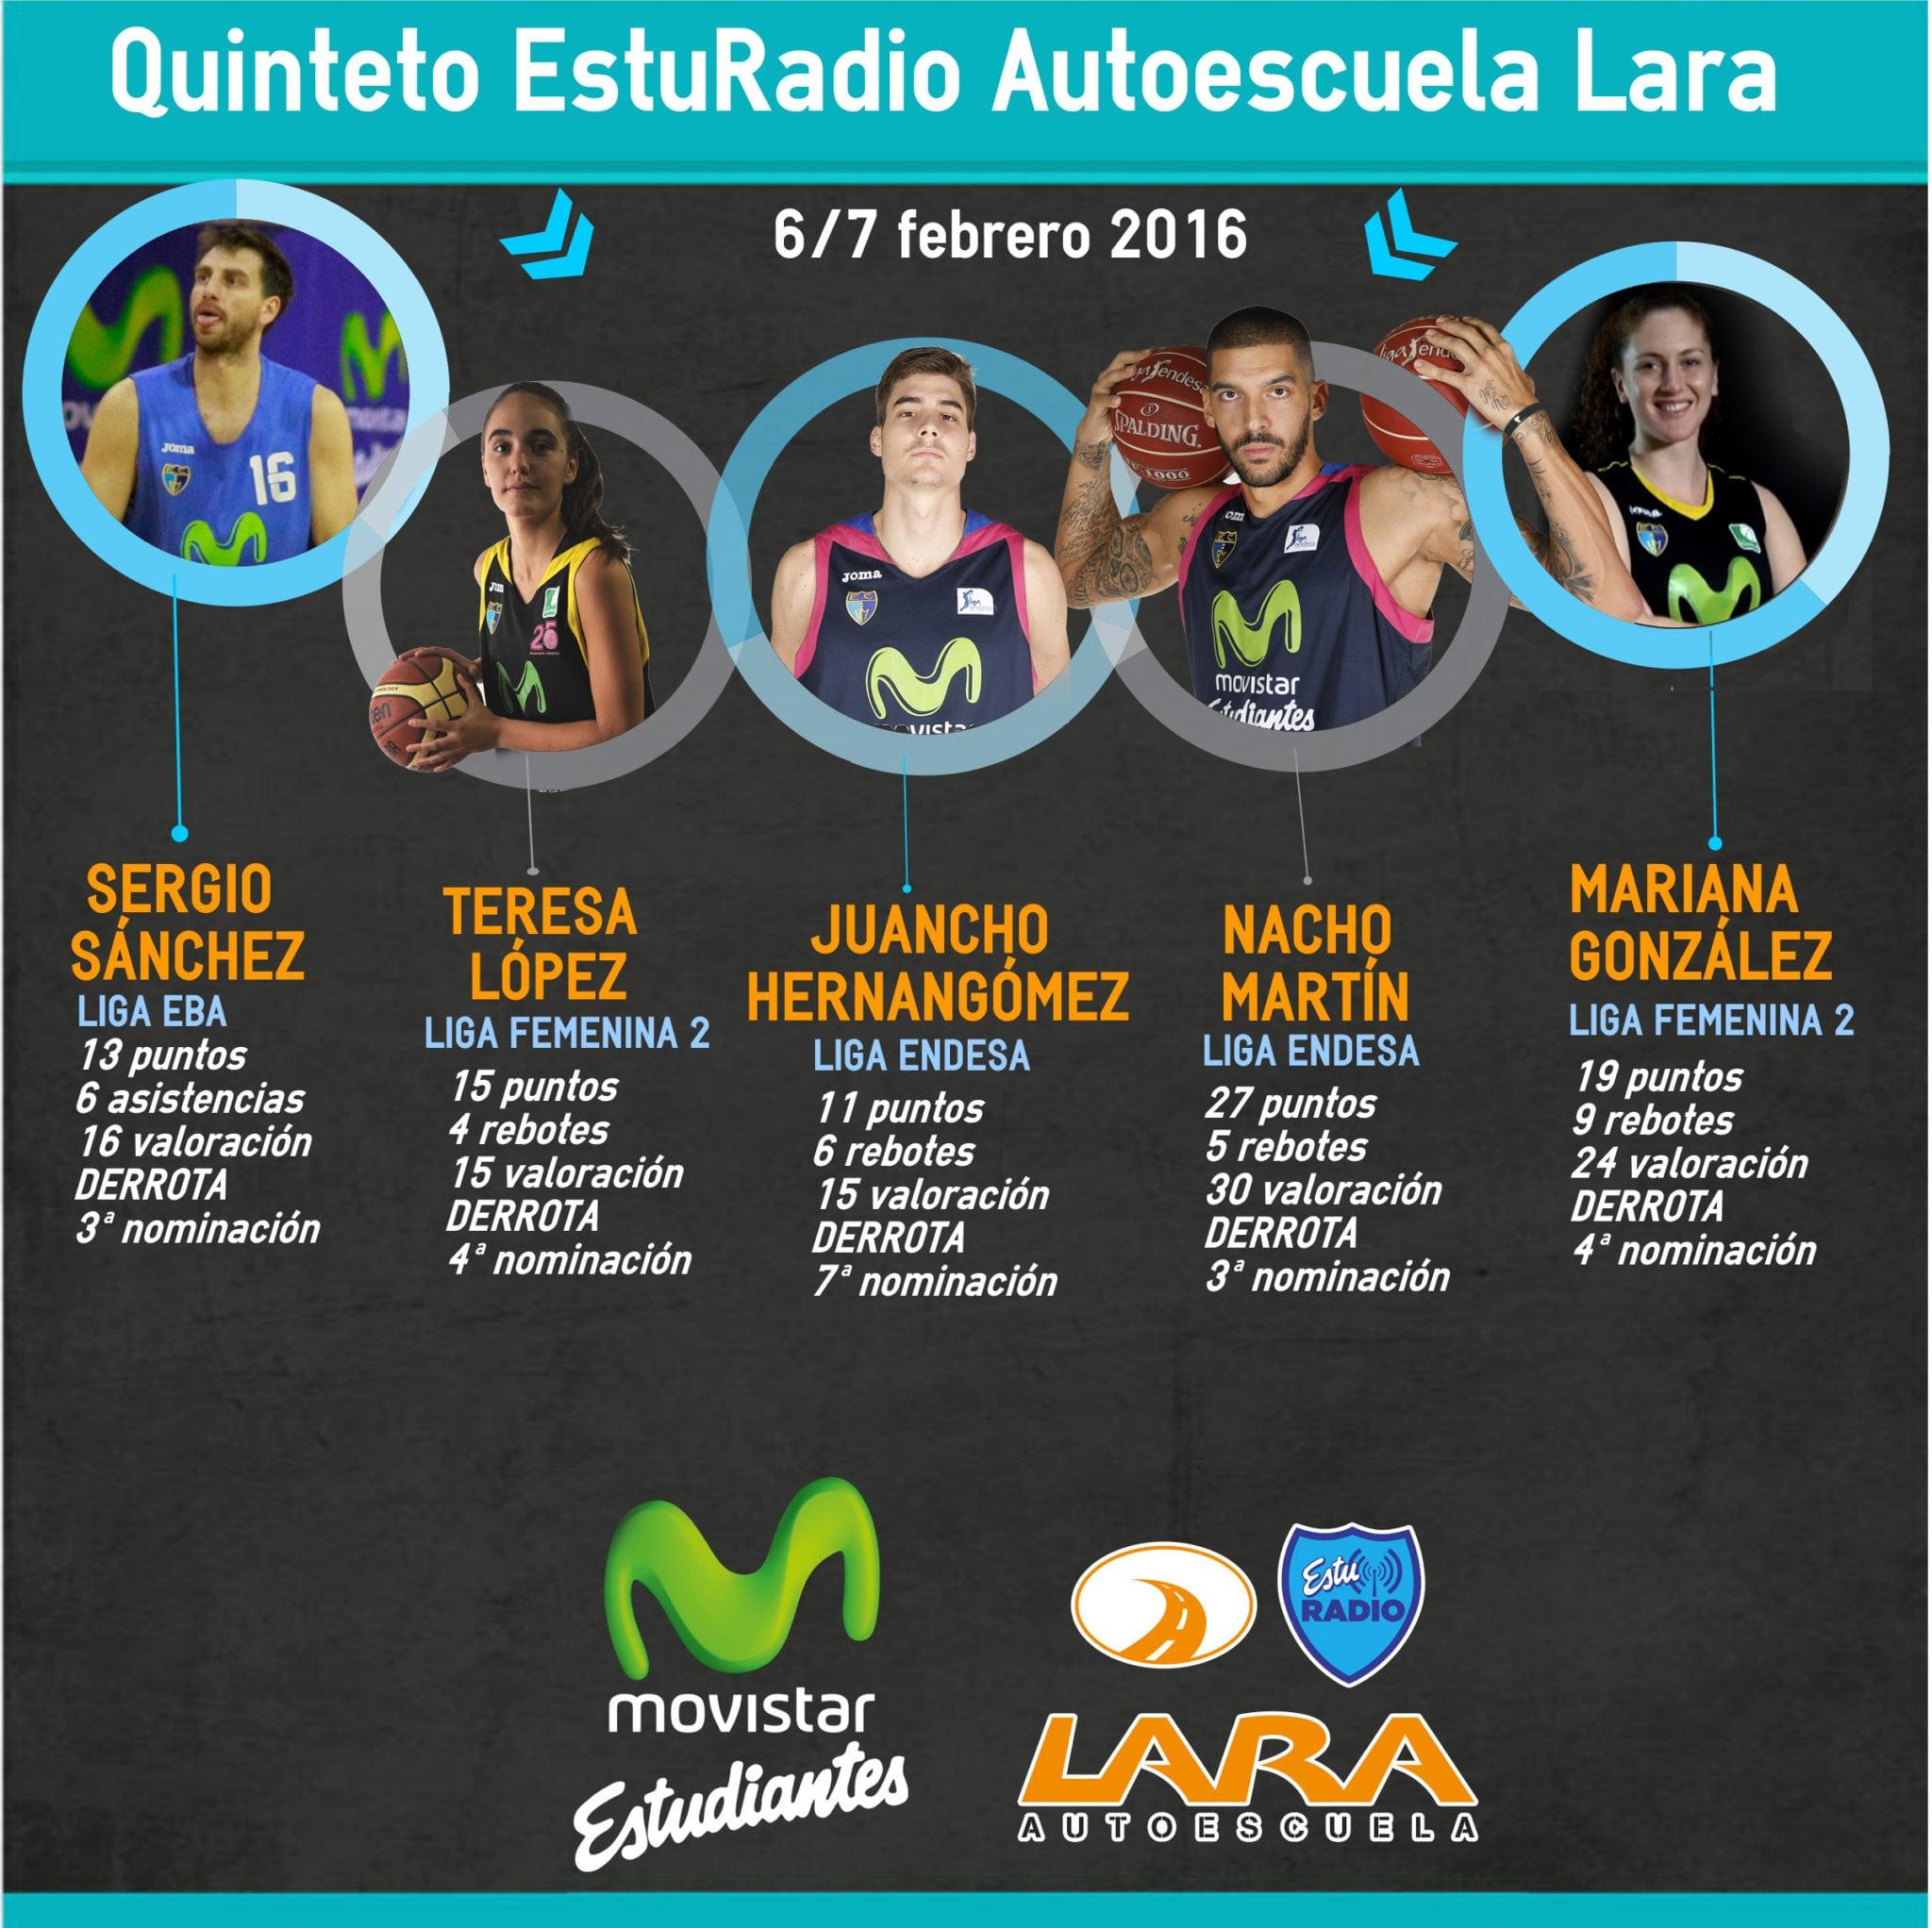 Quinteto EstuRadio: Sergio Sánchez, Teresa López, Juancho Hernangómez, Nacho Martín y Mariana González